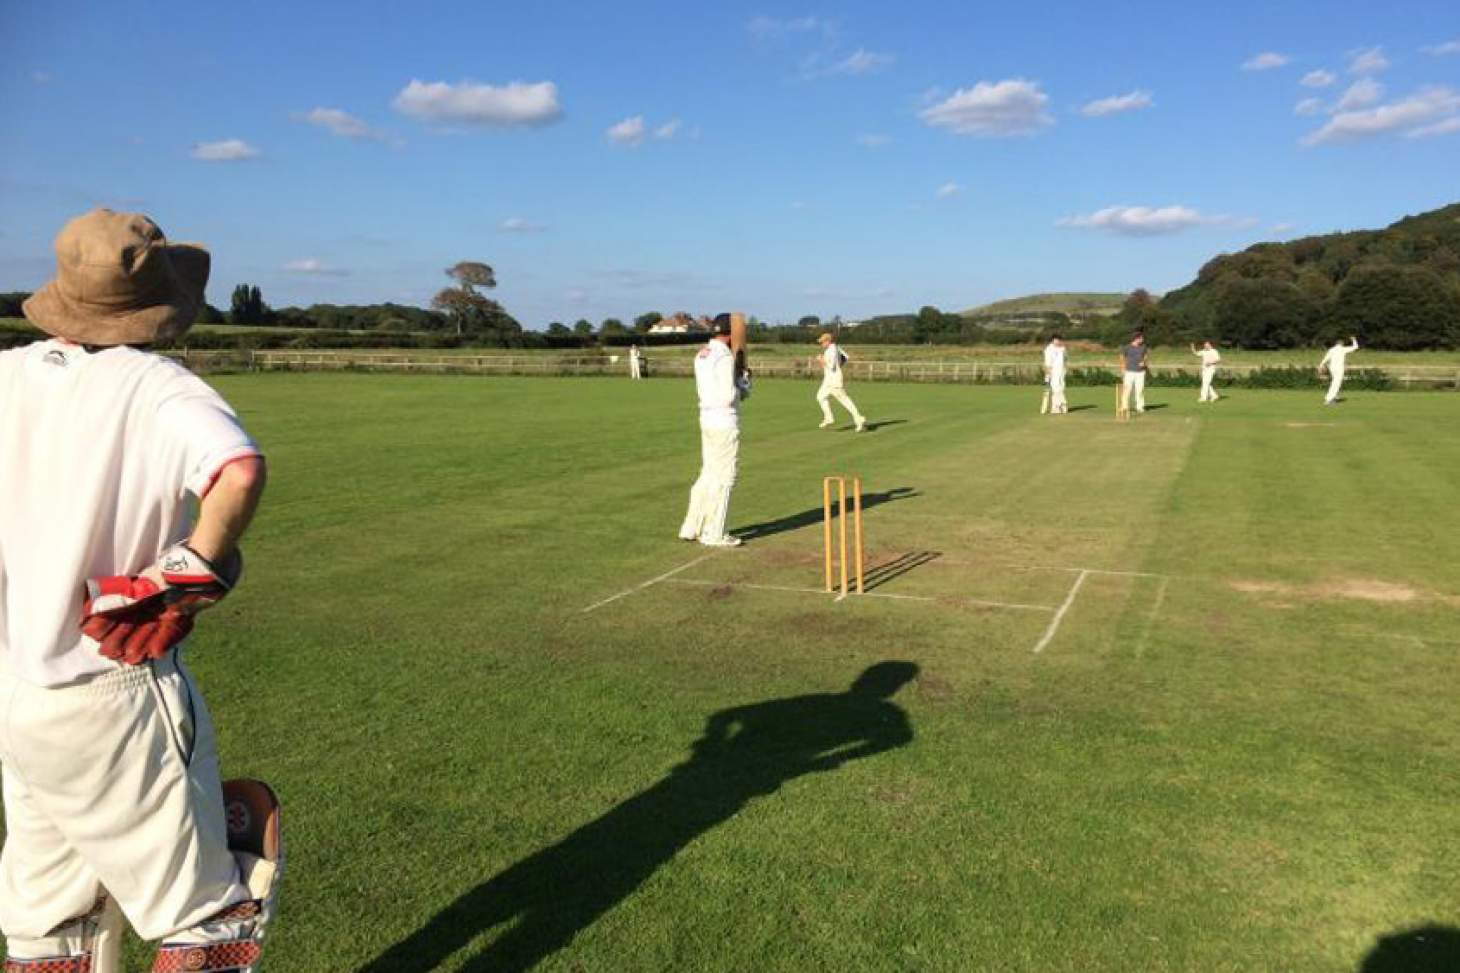 Poynings Cricket Club Full size | Grass cricket facilities